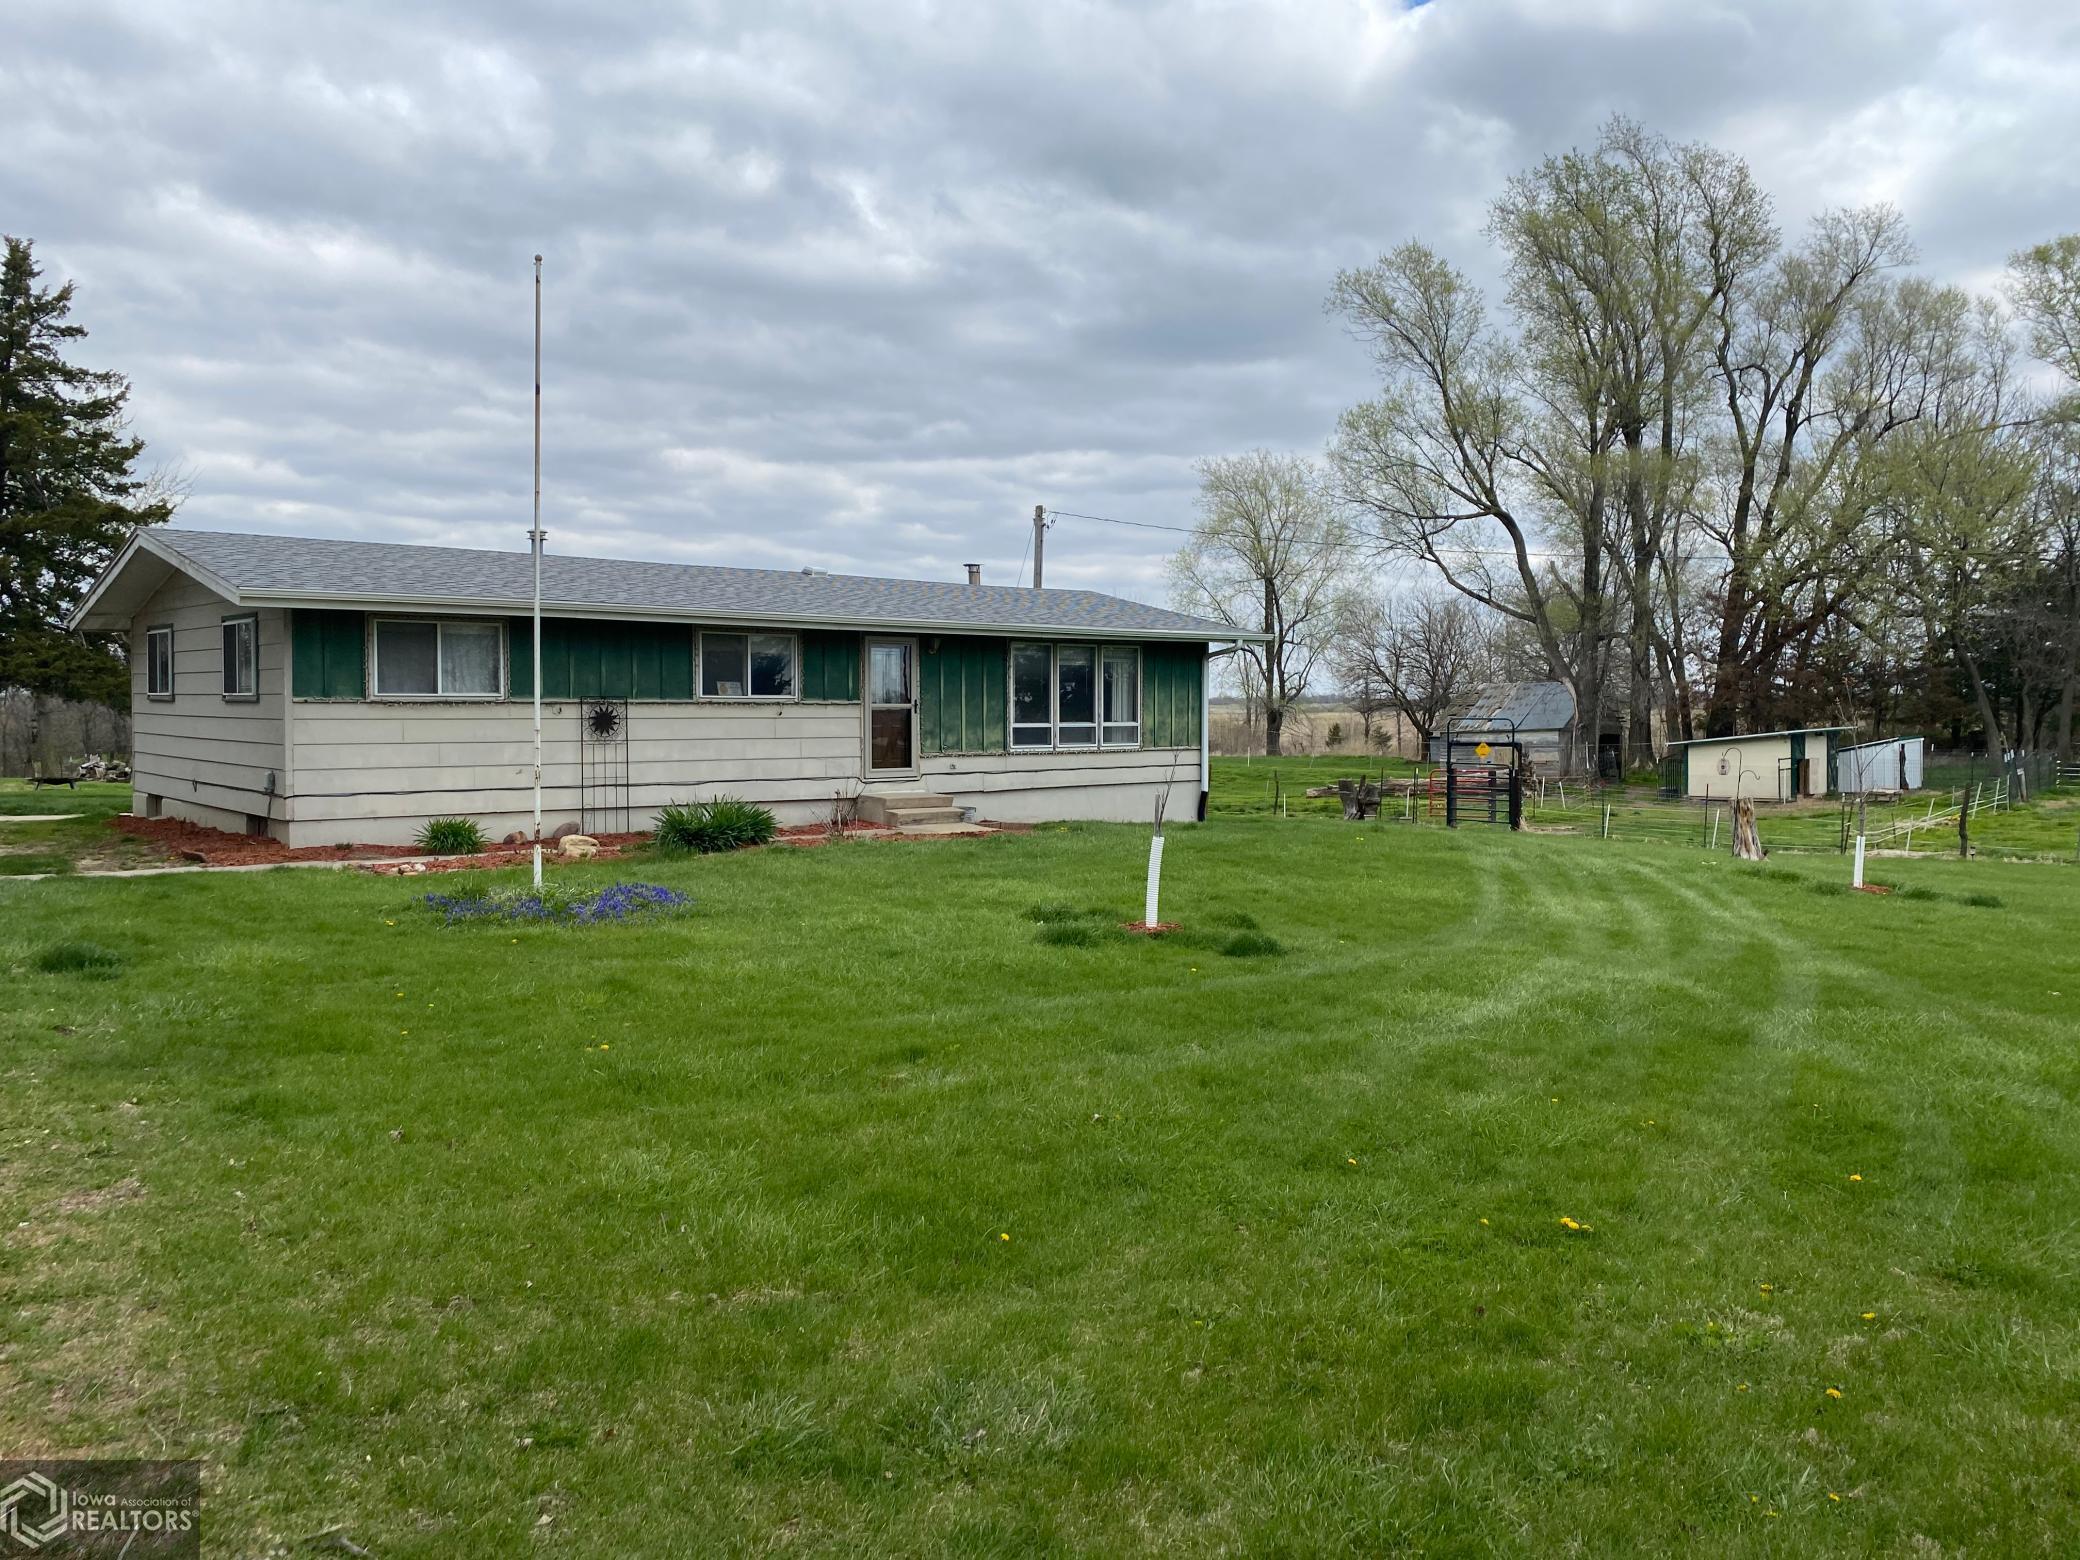 1561 340th, Eddyville, Iowa 52553-9759, 3 Bedrooms Bedrooms, ,1 BathroomBathrooms,Single Family,For Sale,340th,5740525